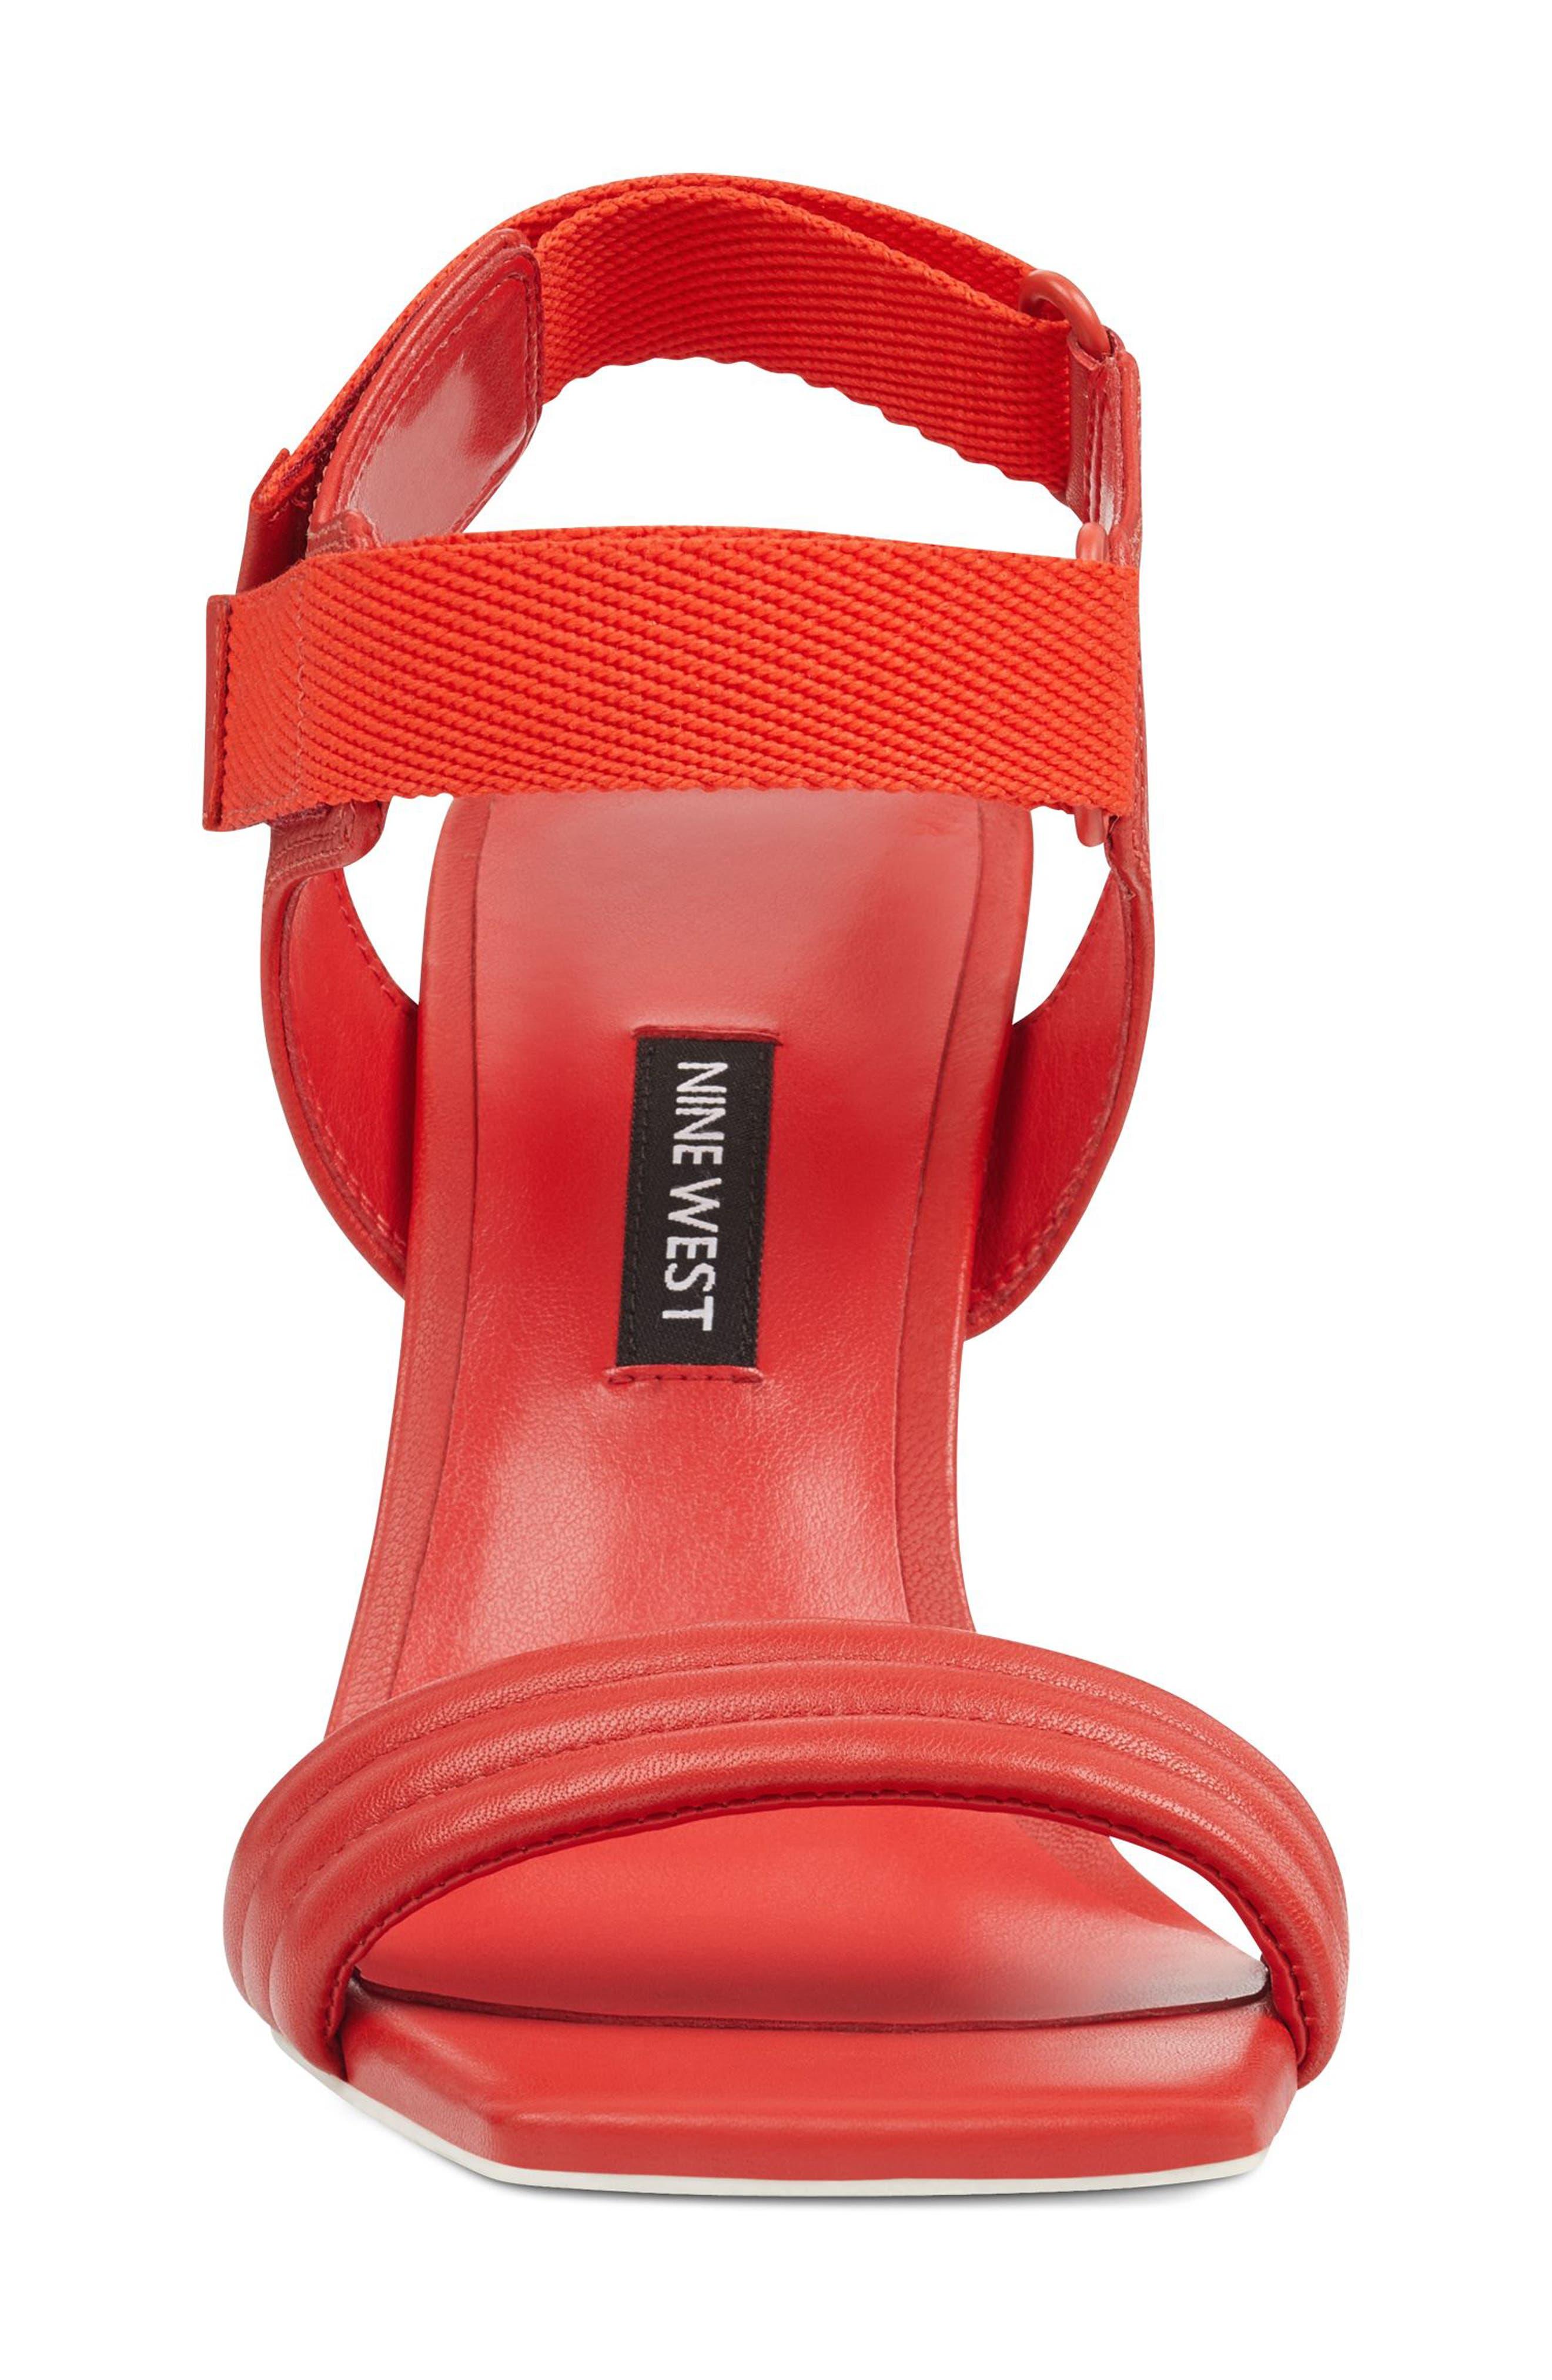 Zebree Sandal,                             Alternate thumbnail 3, color,                             Red Leather